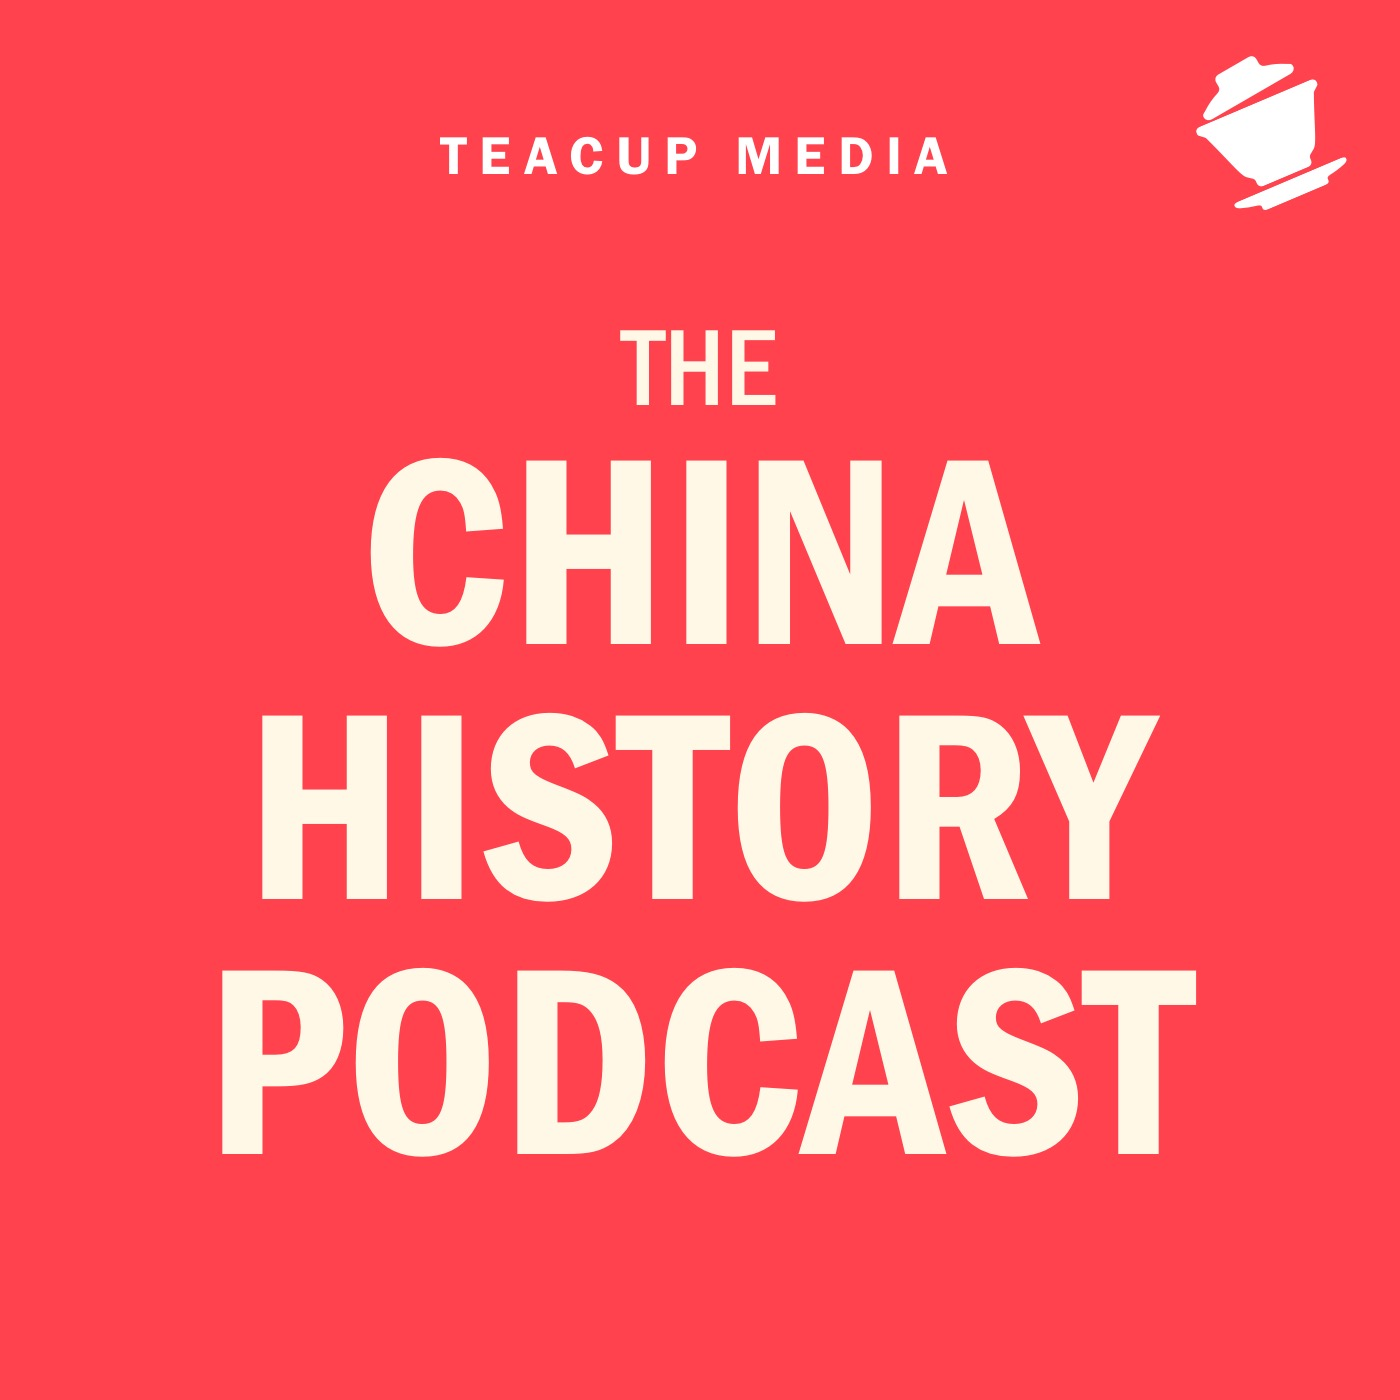 The China History Podcast show art